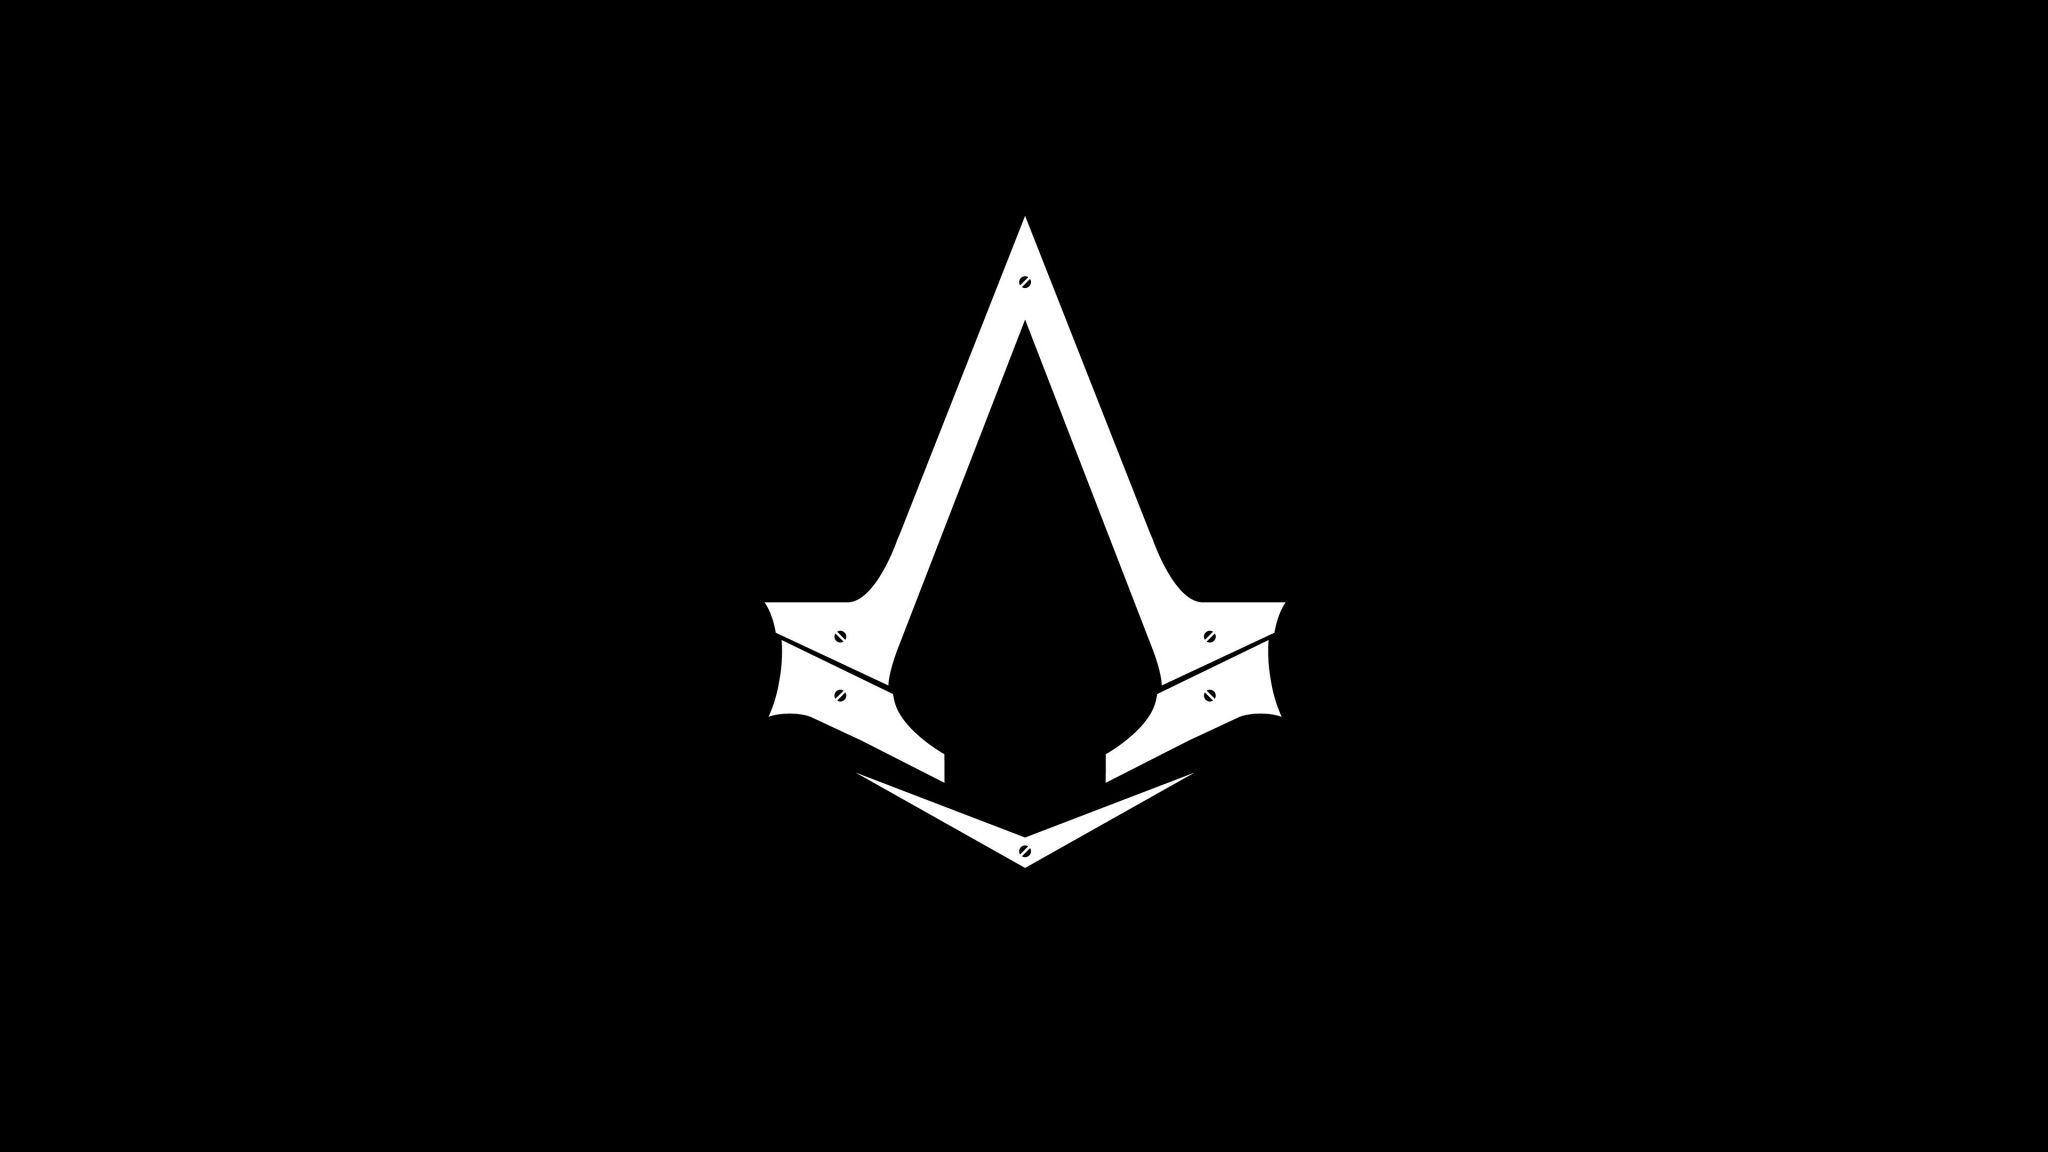 Assassins Creed Free Screensaver Wallpapers Assassins Creed Logo Assassins Creed Syndicate Assassin S Creed Wallpaper